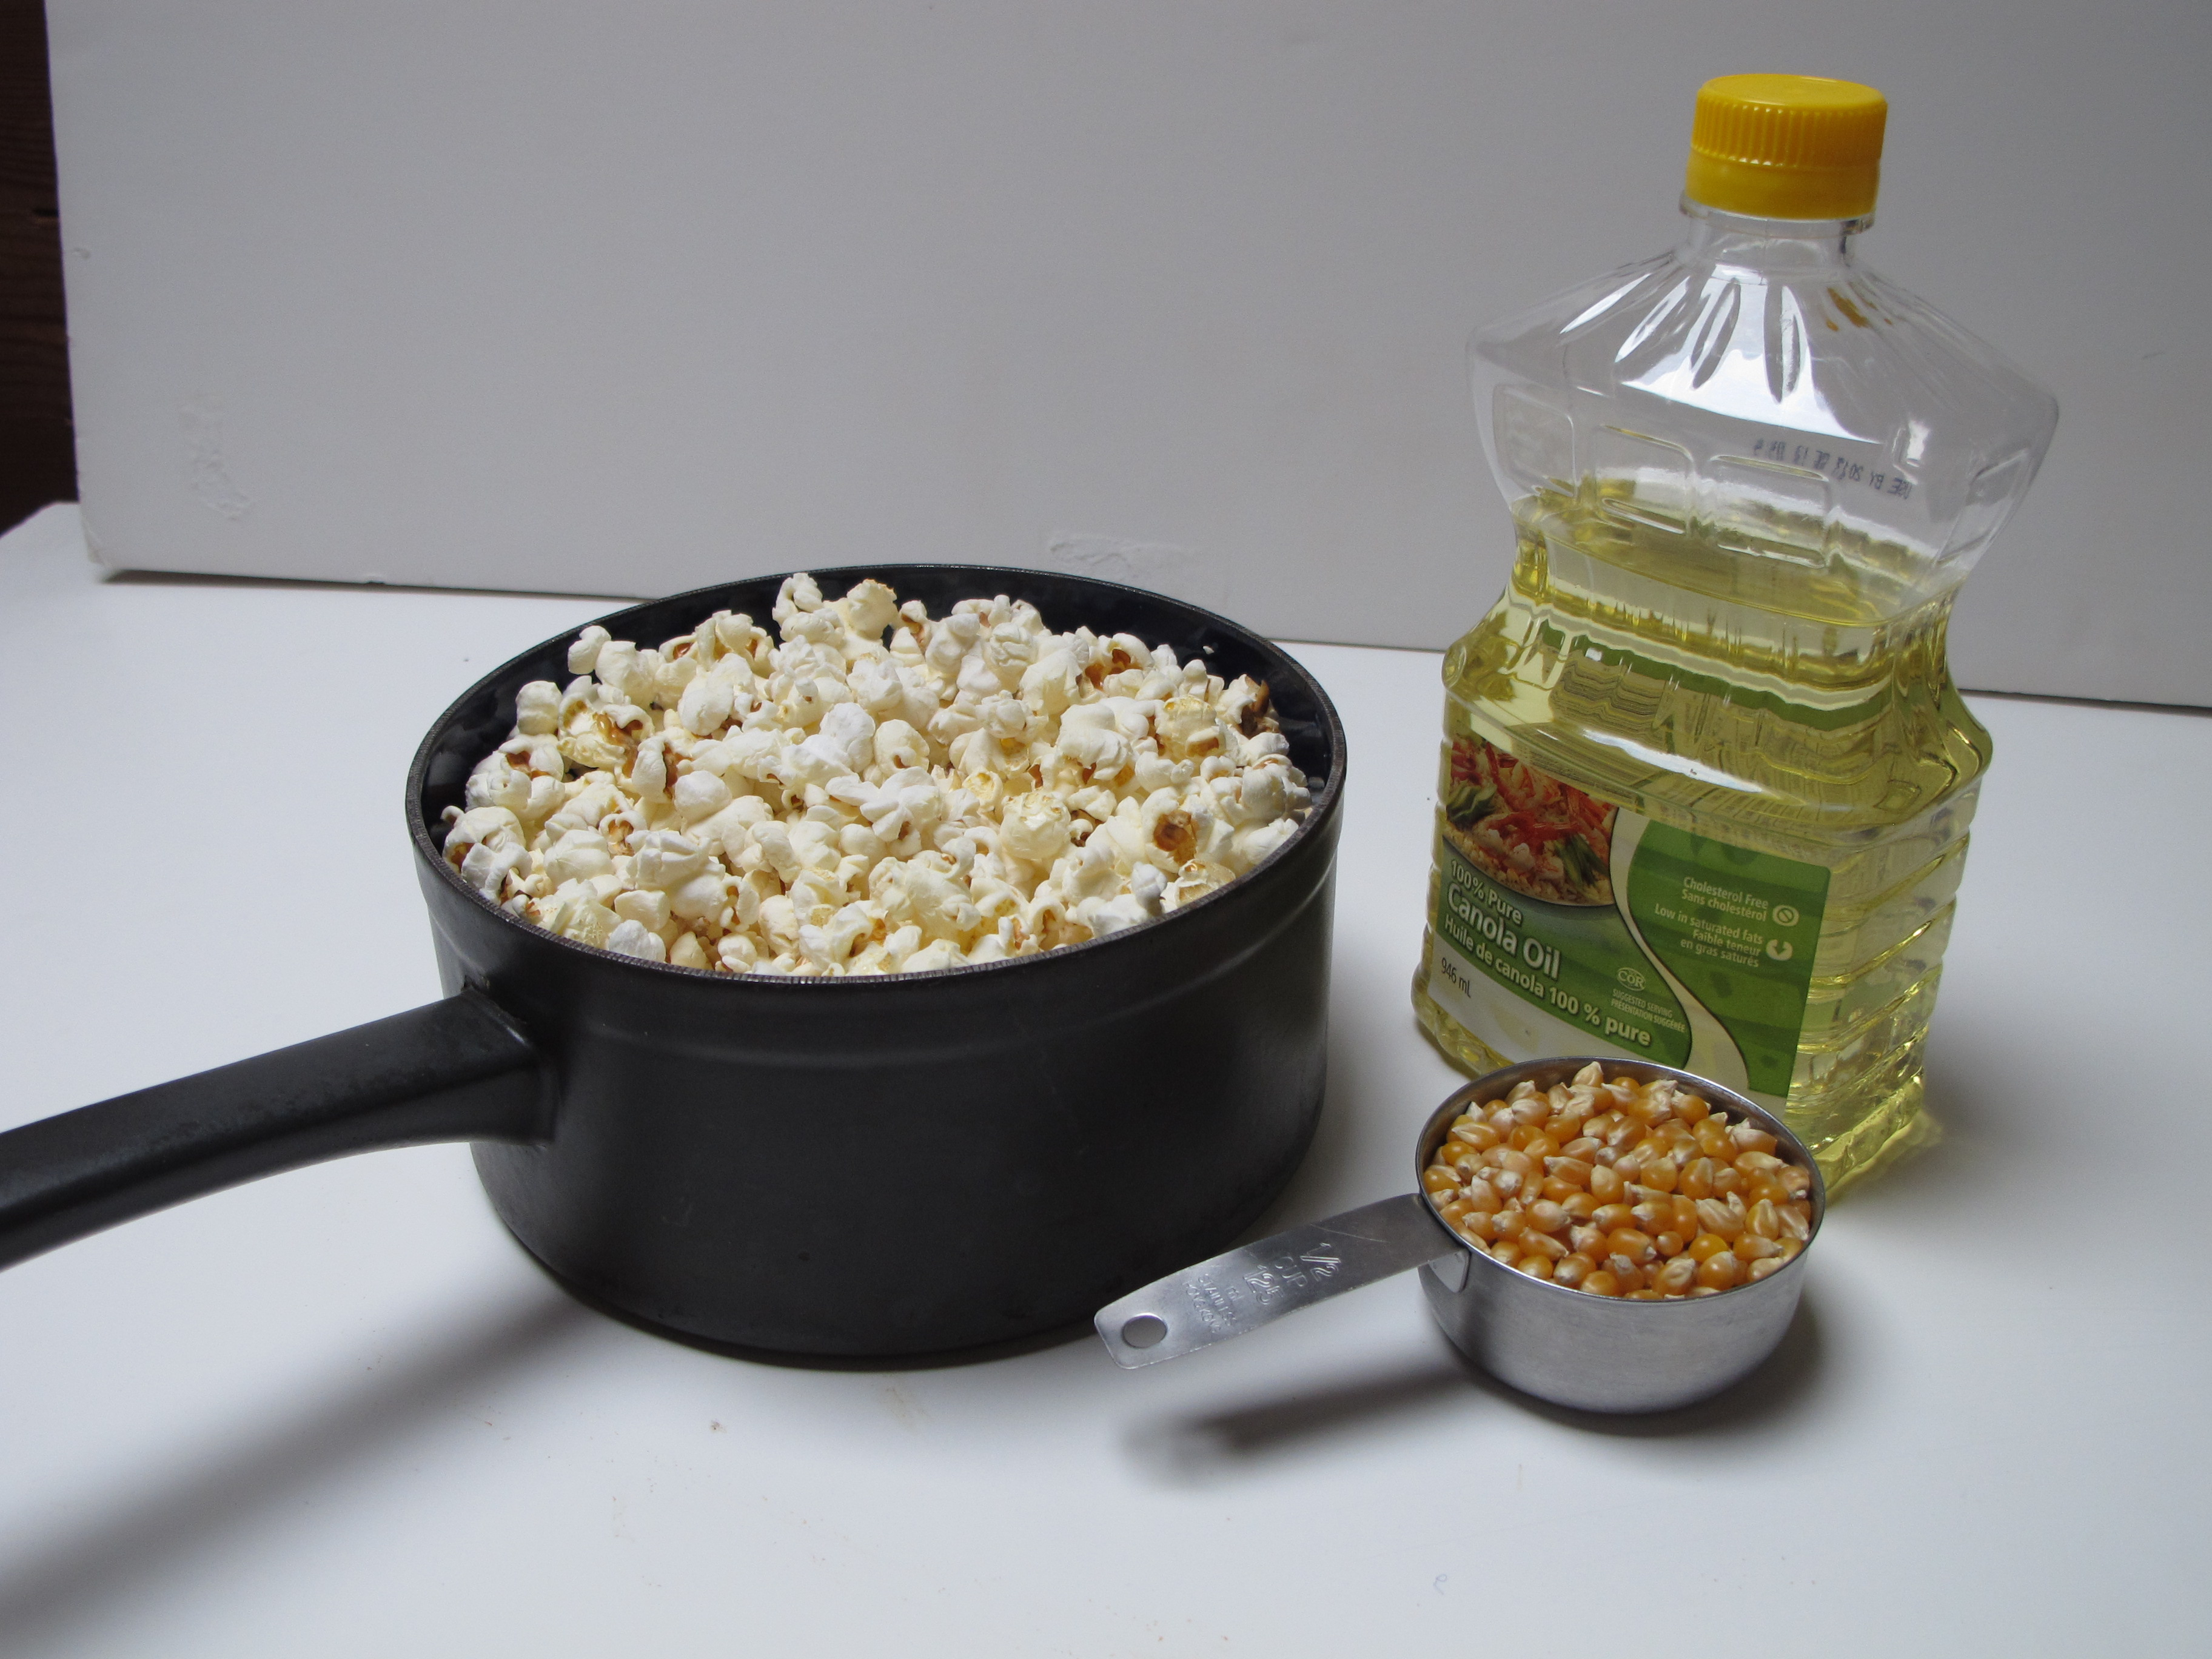 activity observation of popcorn popper